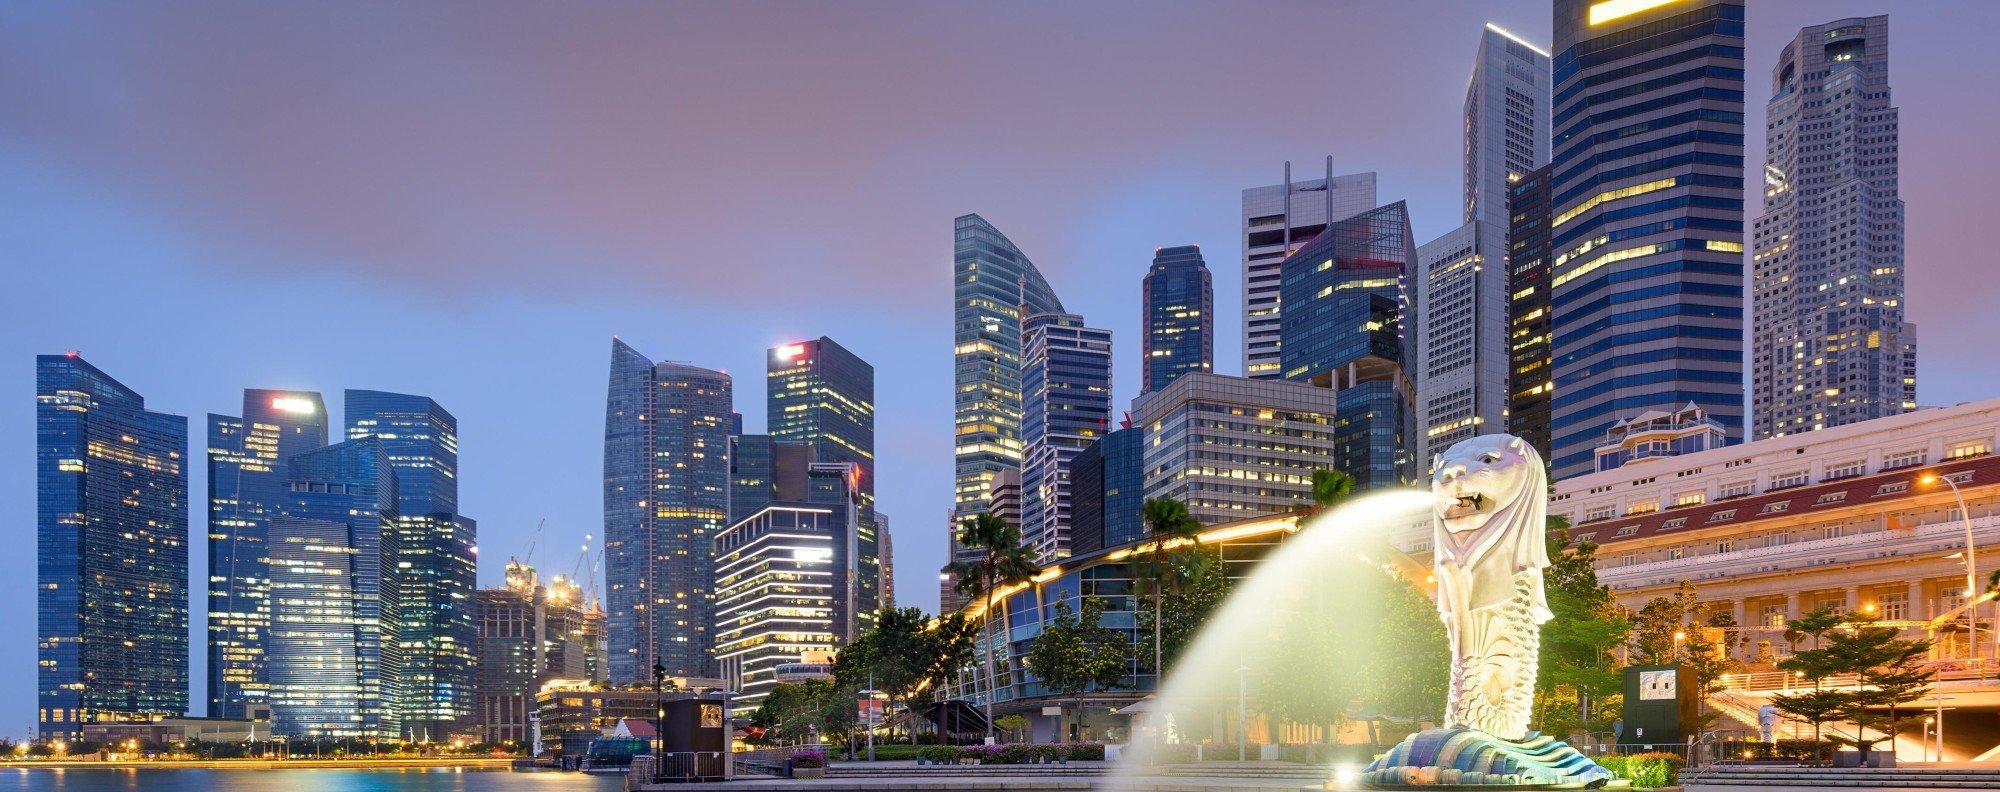 The Singapore skyline. Photo: Handout